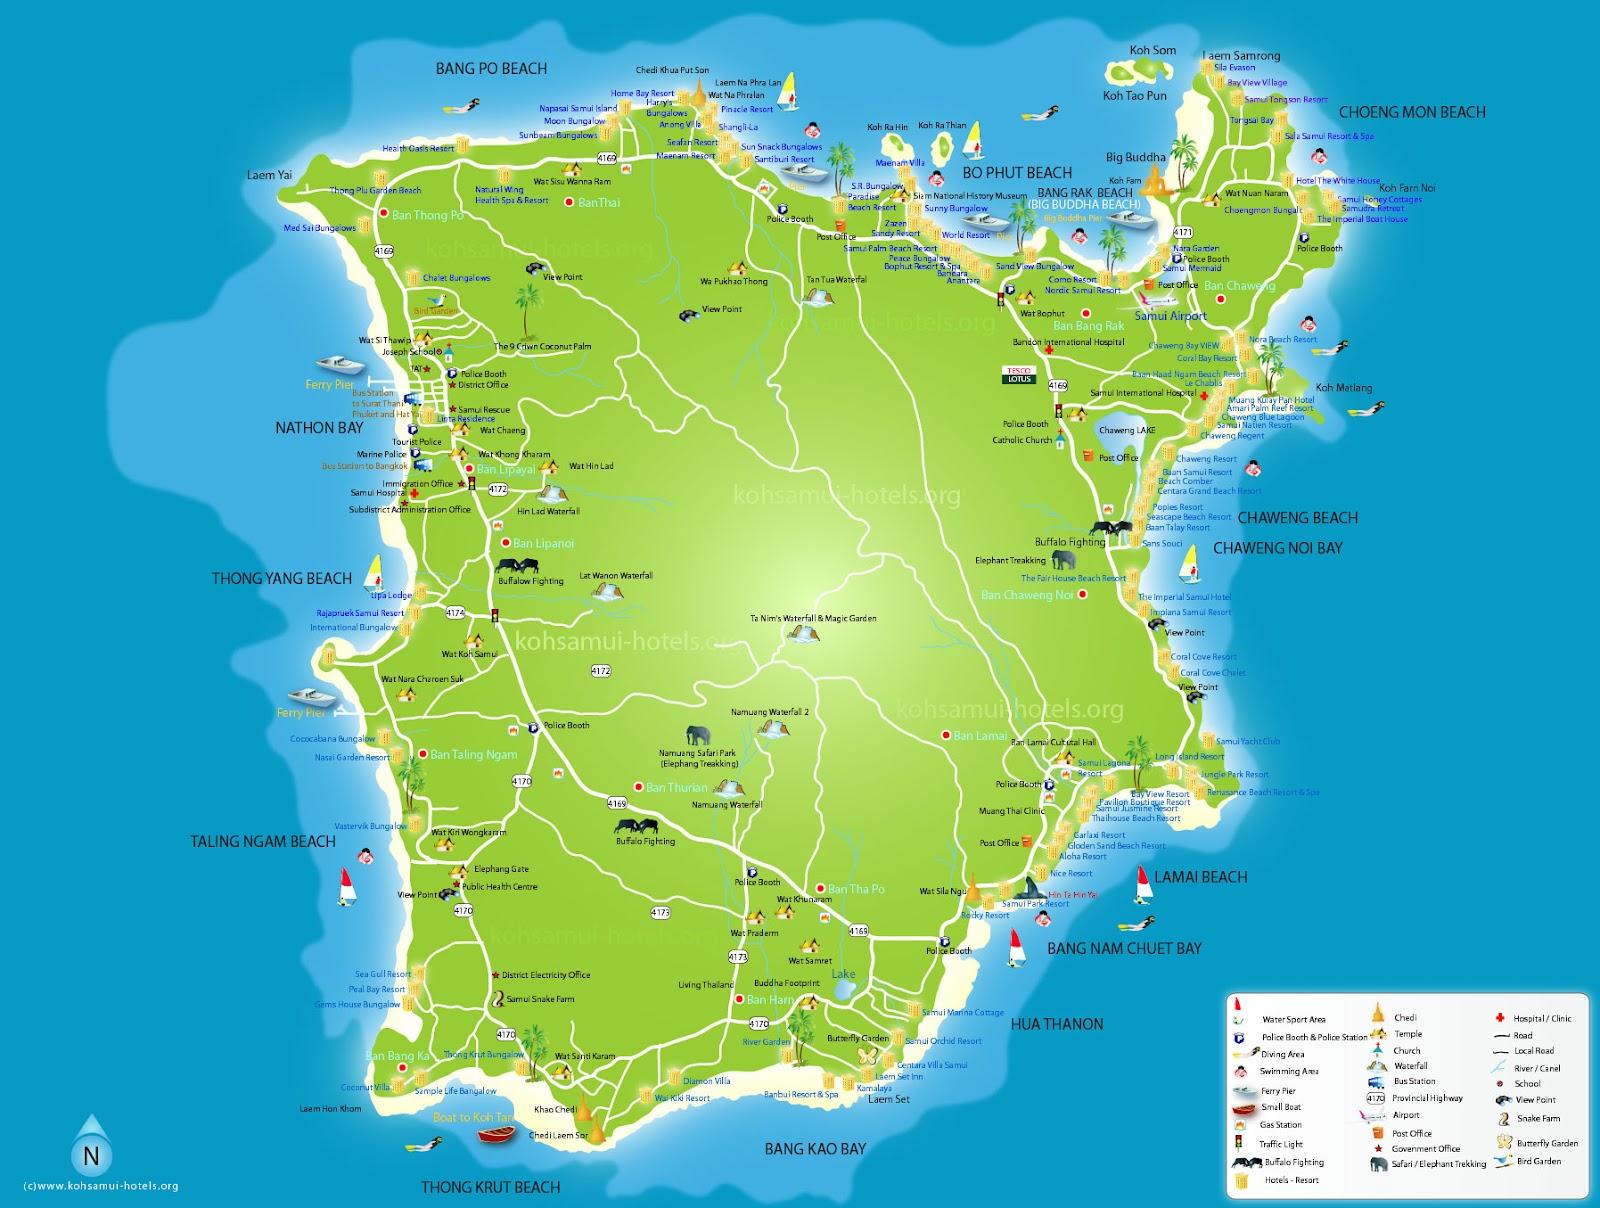 Koh Samui to Koh Tao Map Map of Koh Samui And of The